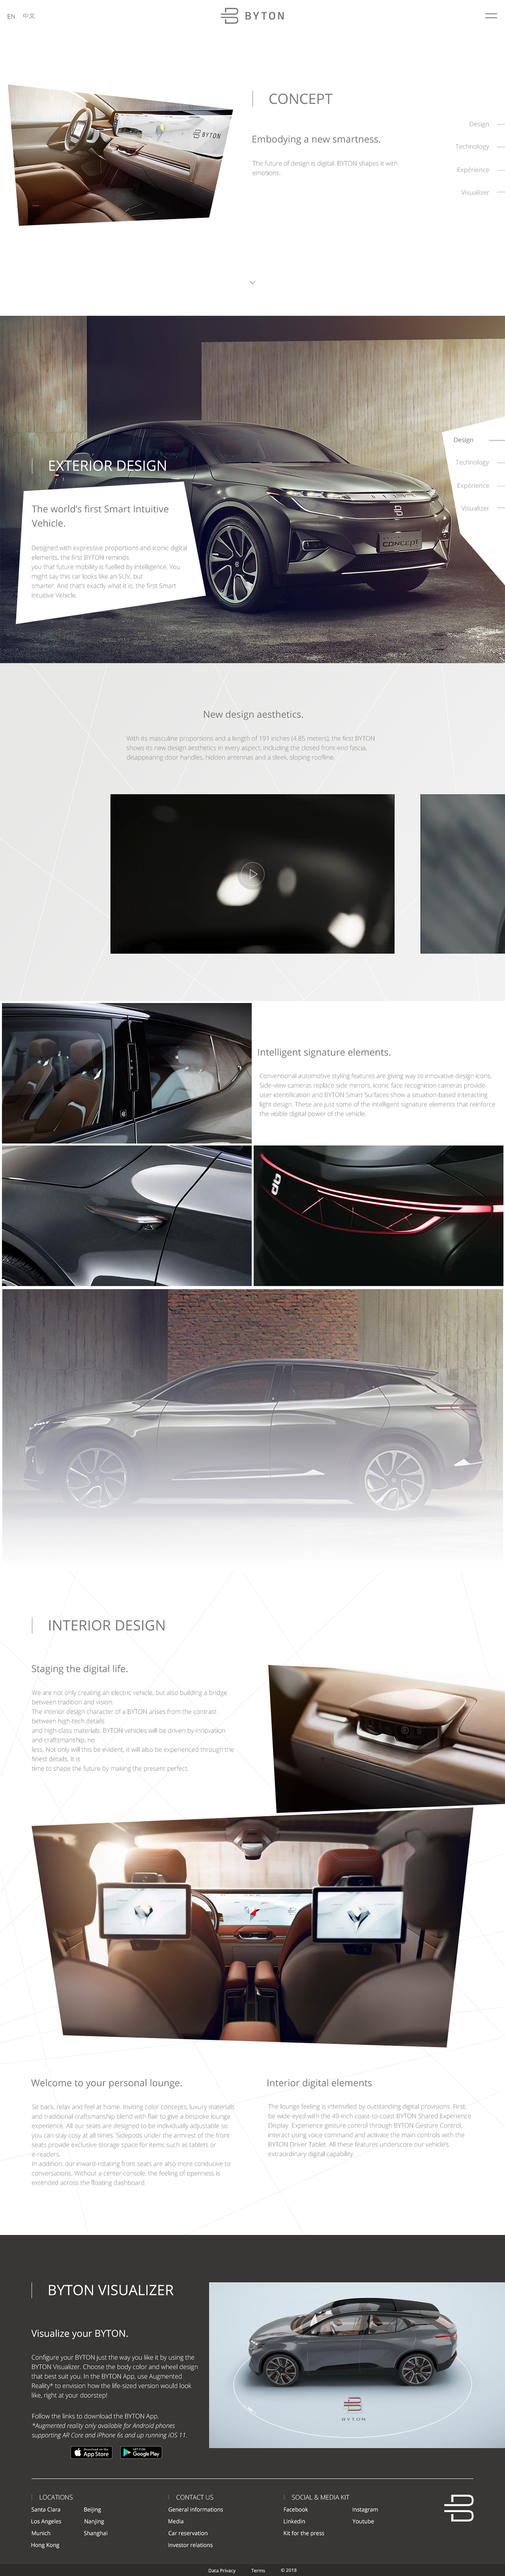 Byton car electric Website UI